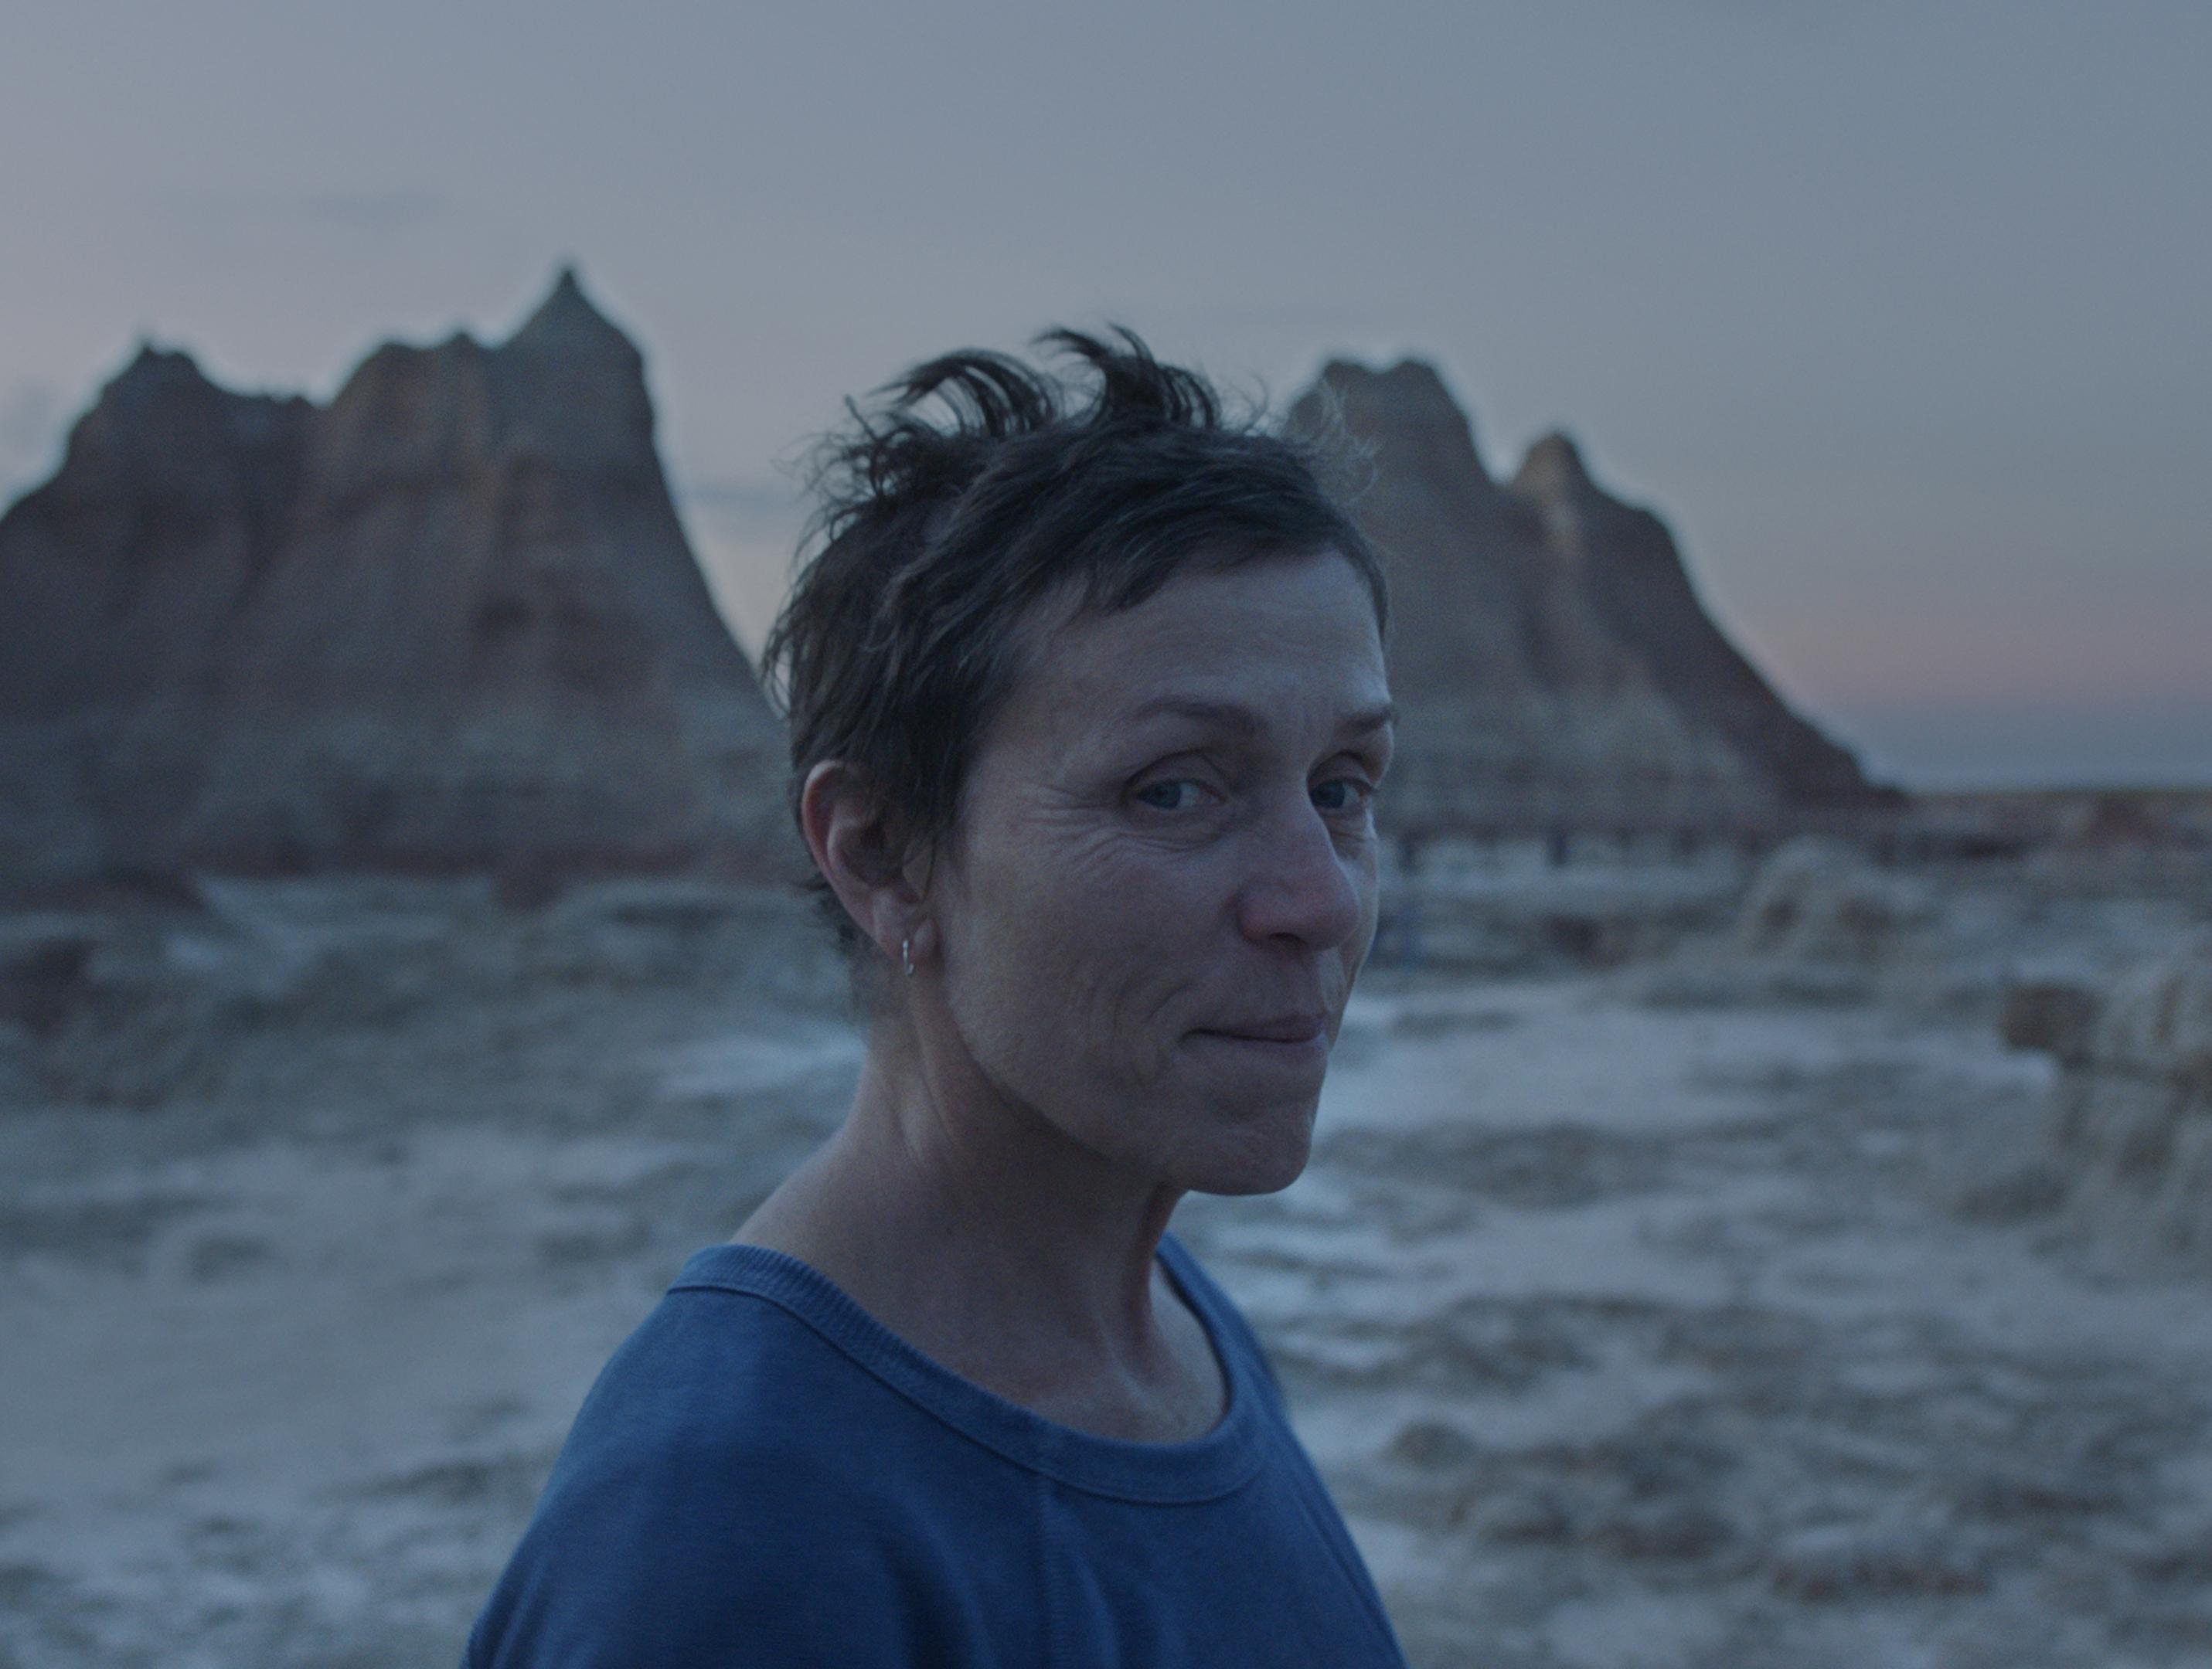 Frances McDormand stars in the film